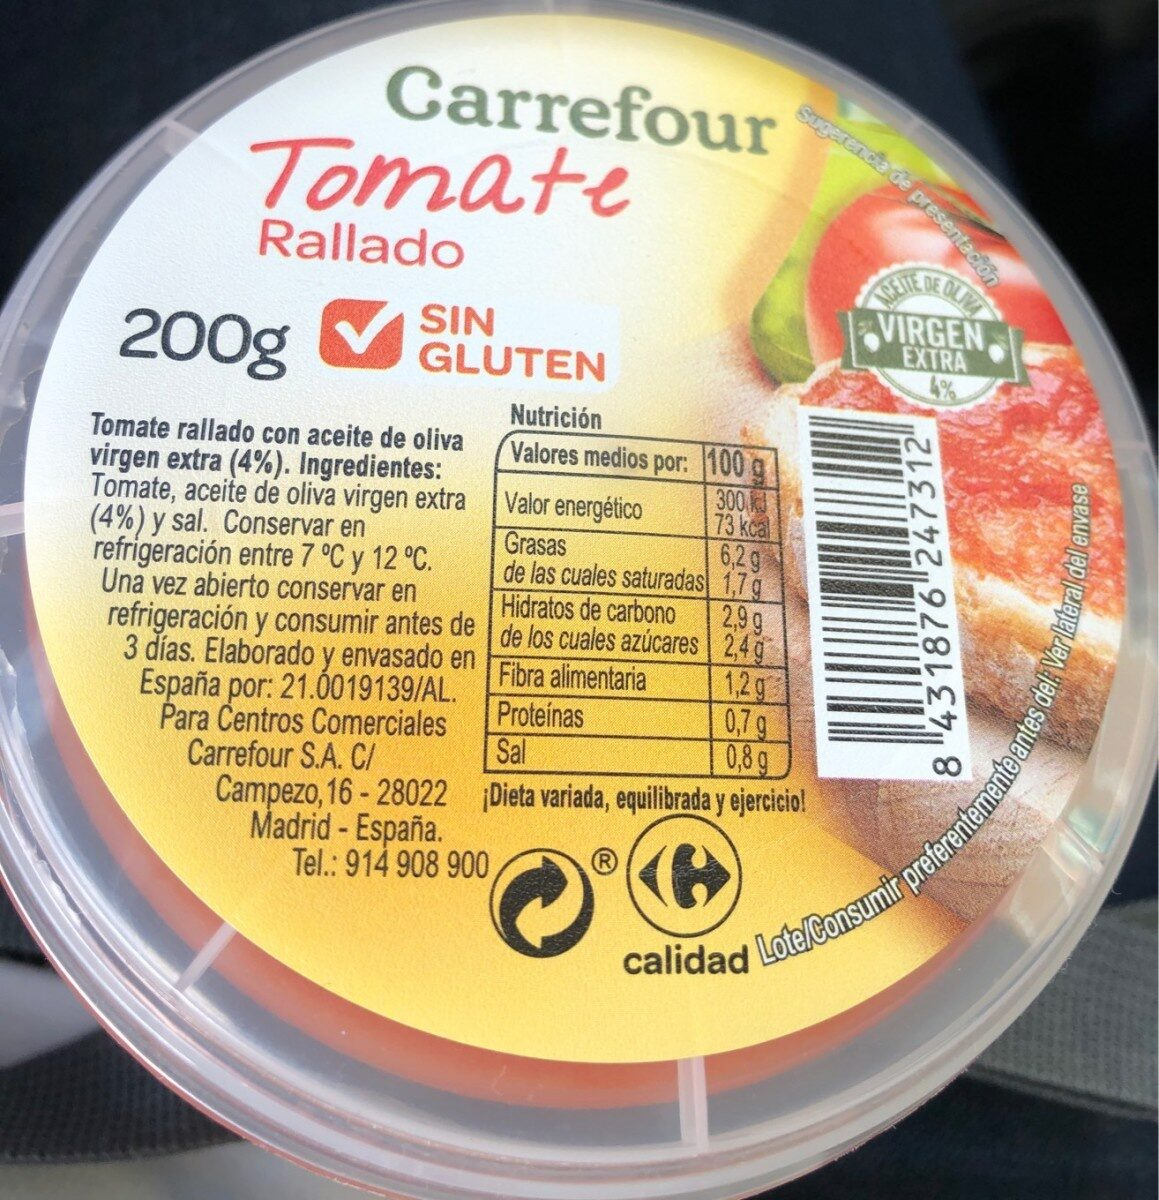 Tomate rallado - Producto